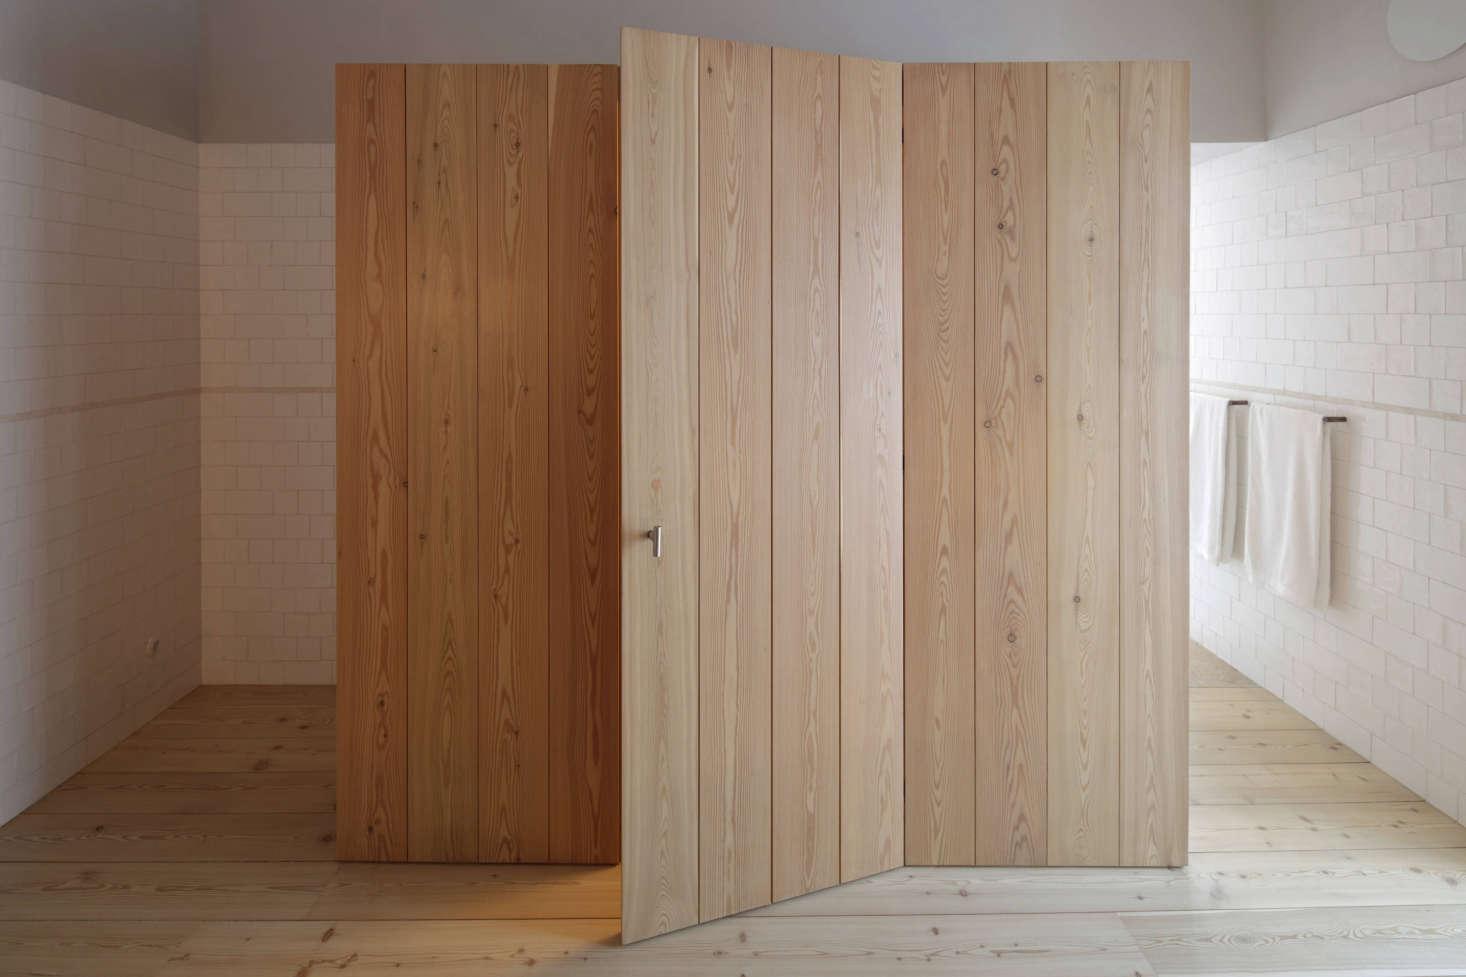 A custom oak closet near the bathroom.